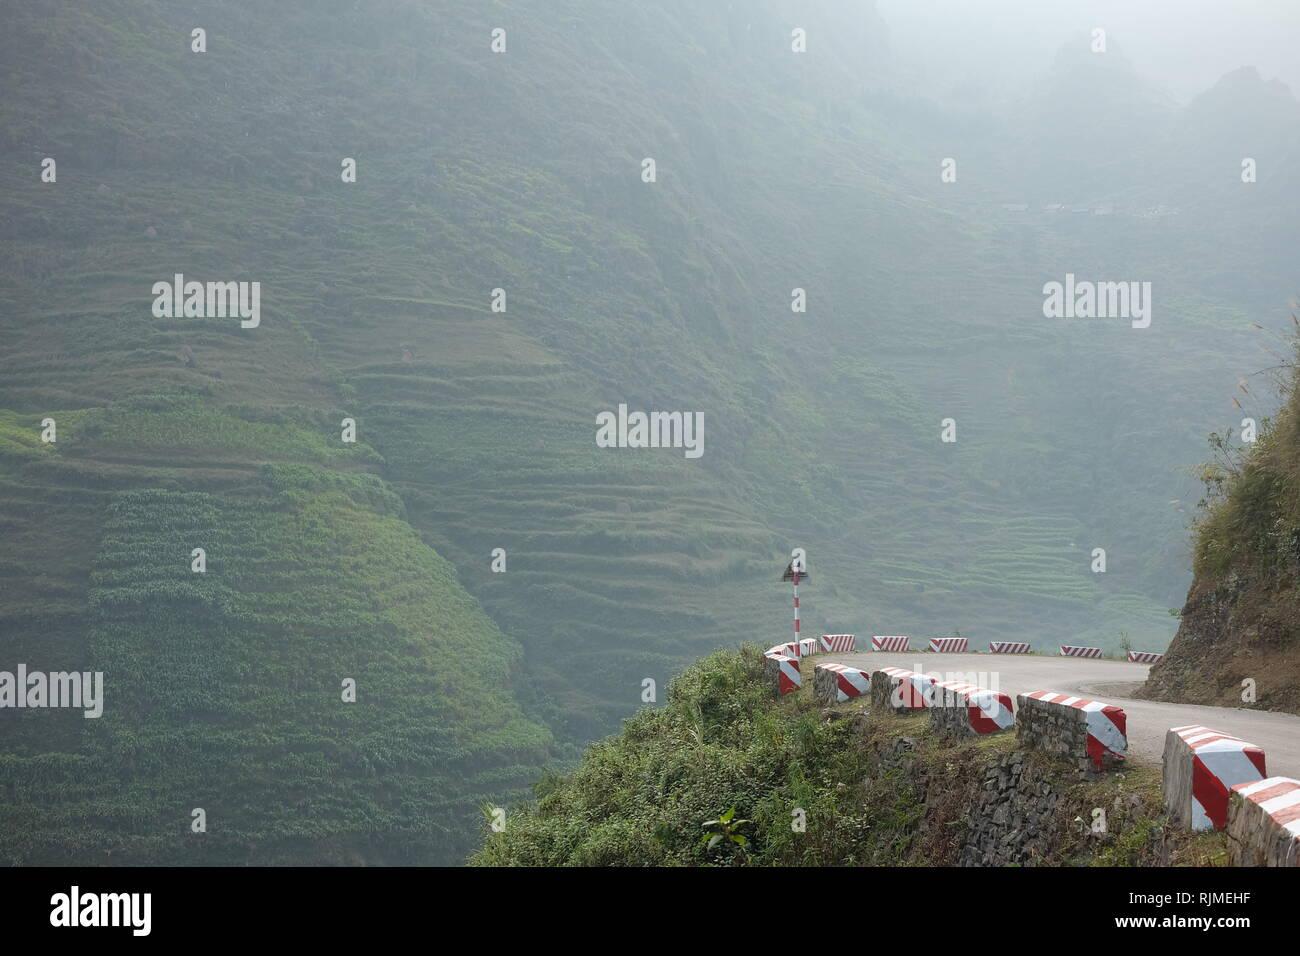 Happiness Road - Ha Giang - Viet Nam - Stock Image